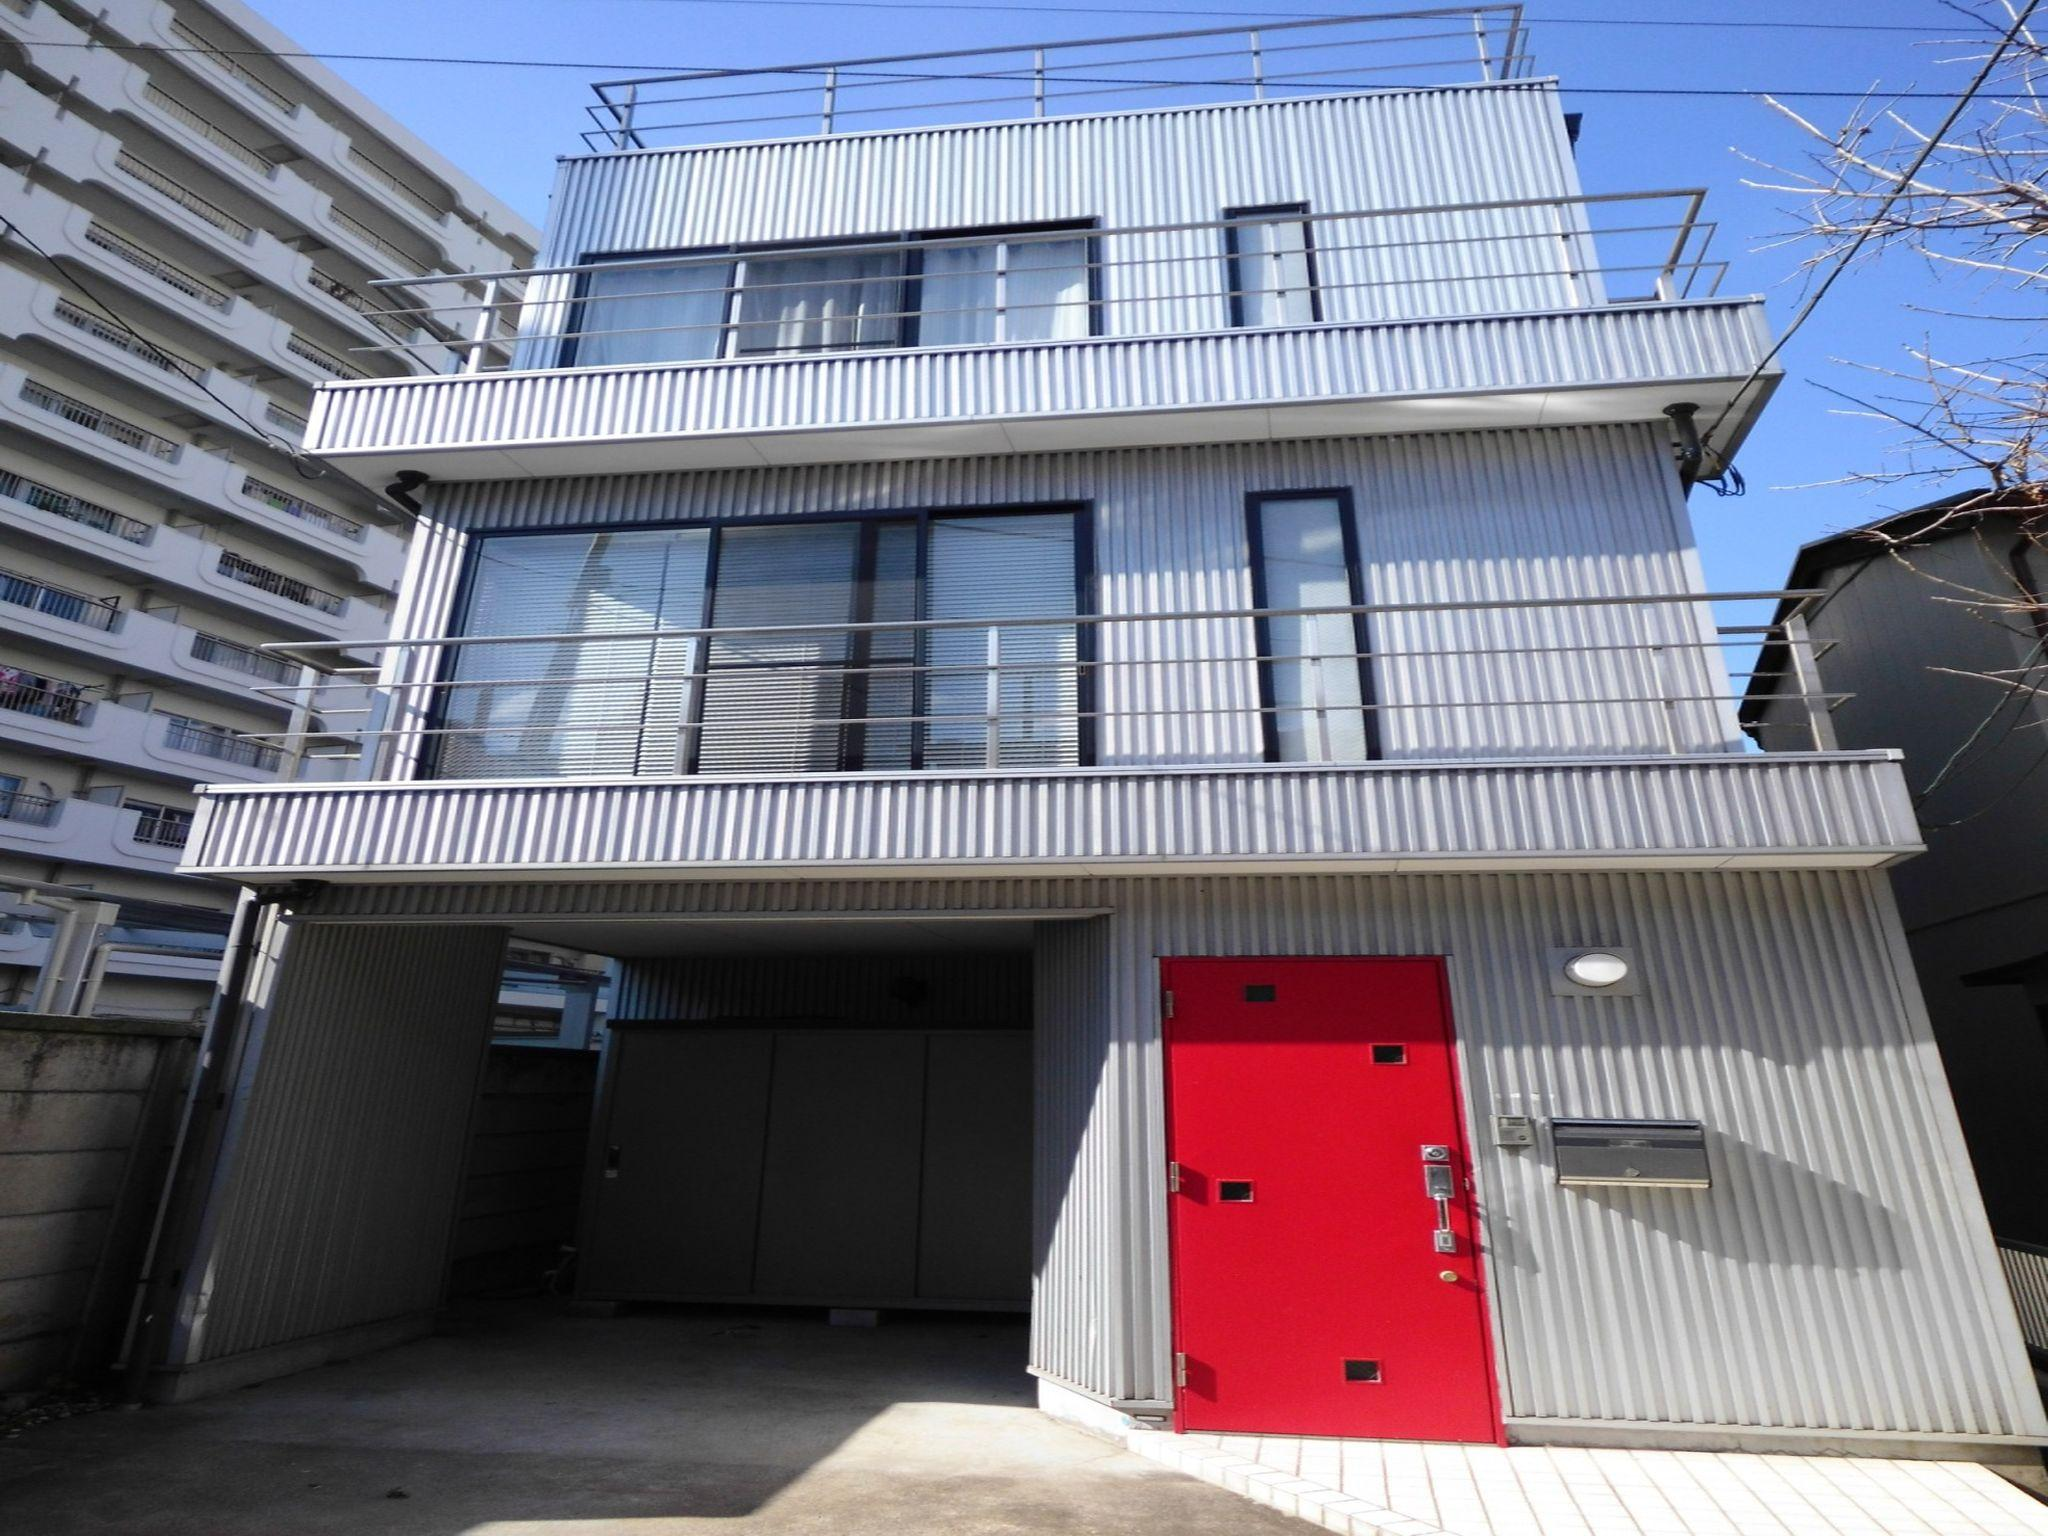 XY APARTMENT Meguro (Share house), Meguro